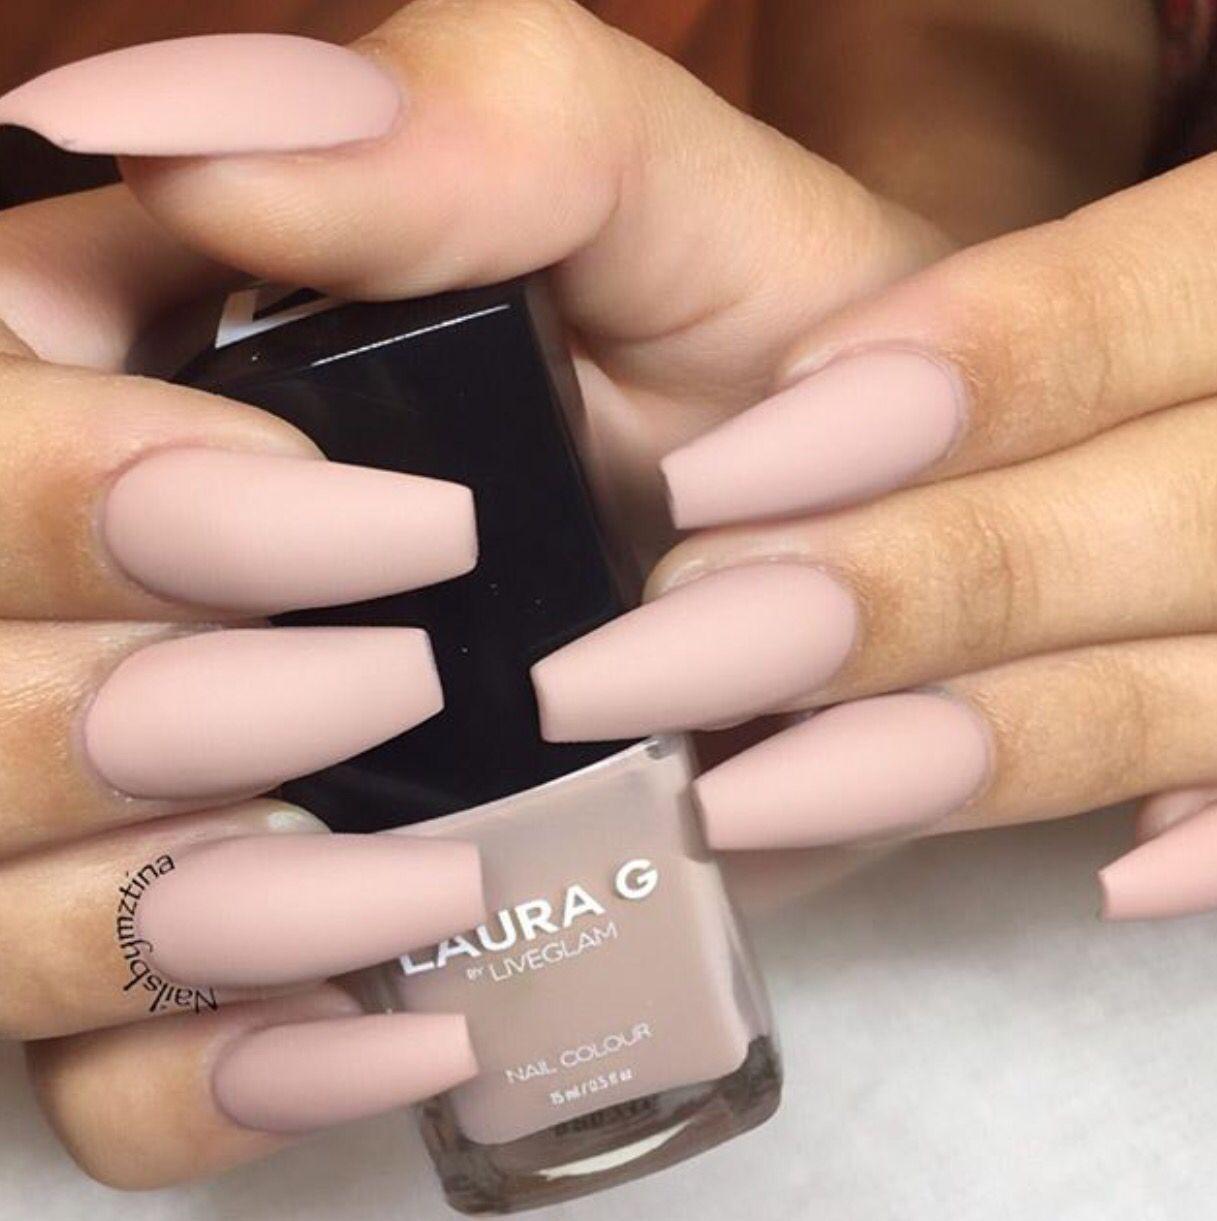 Nails - Nagel | Nails - Nagel | Pinterest | Nail inspo, Gorgeous ...